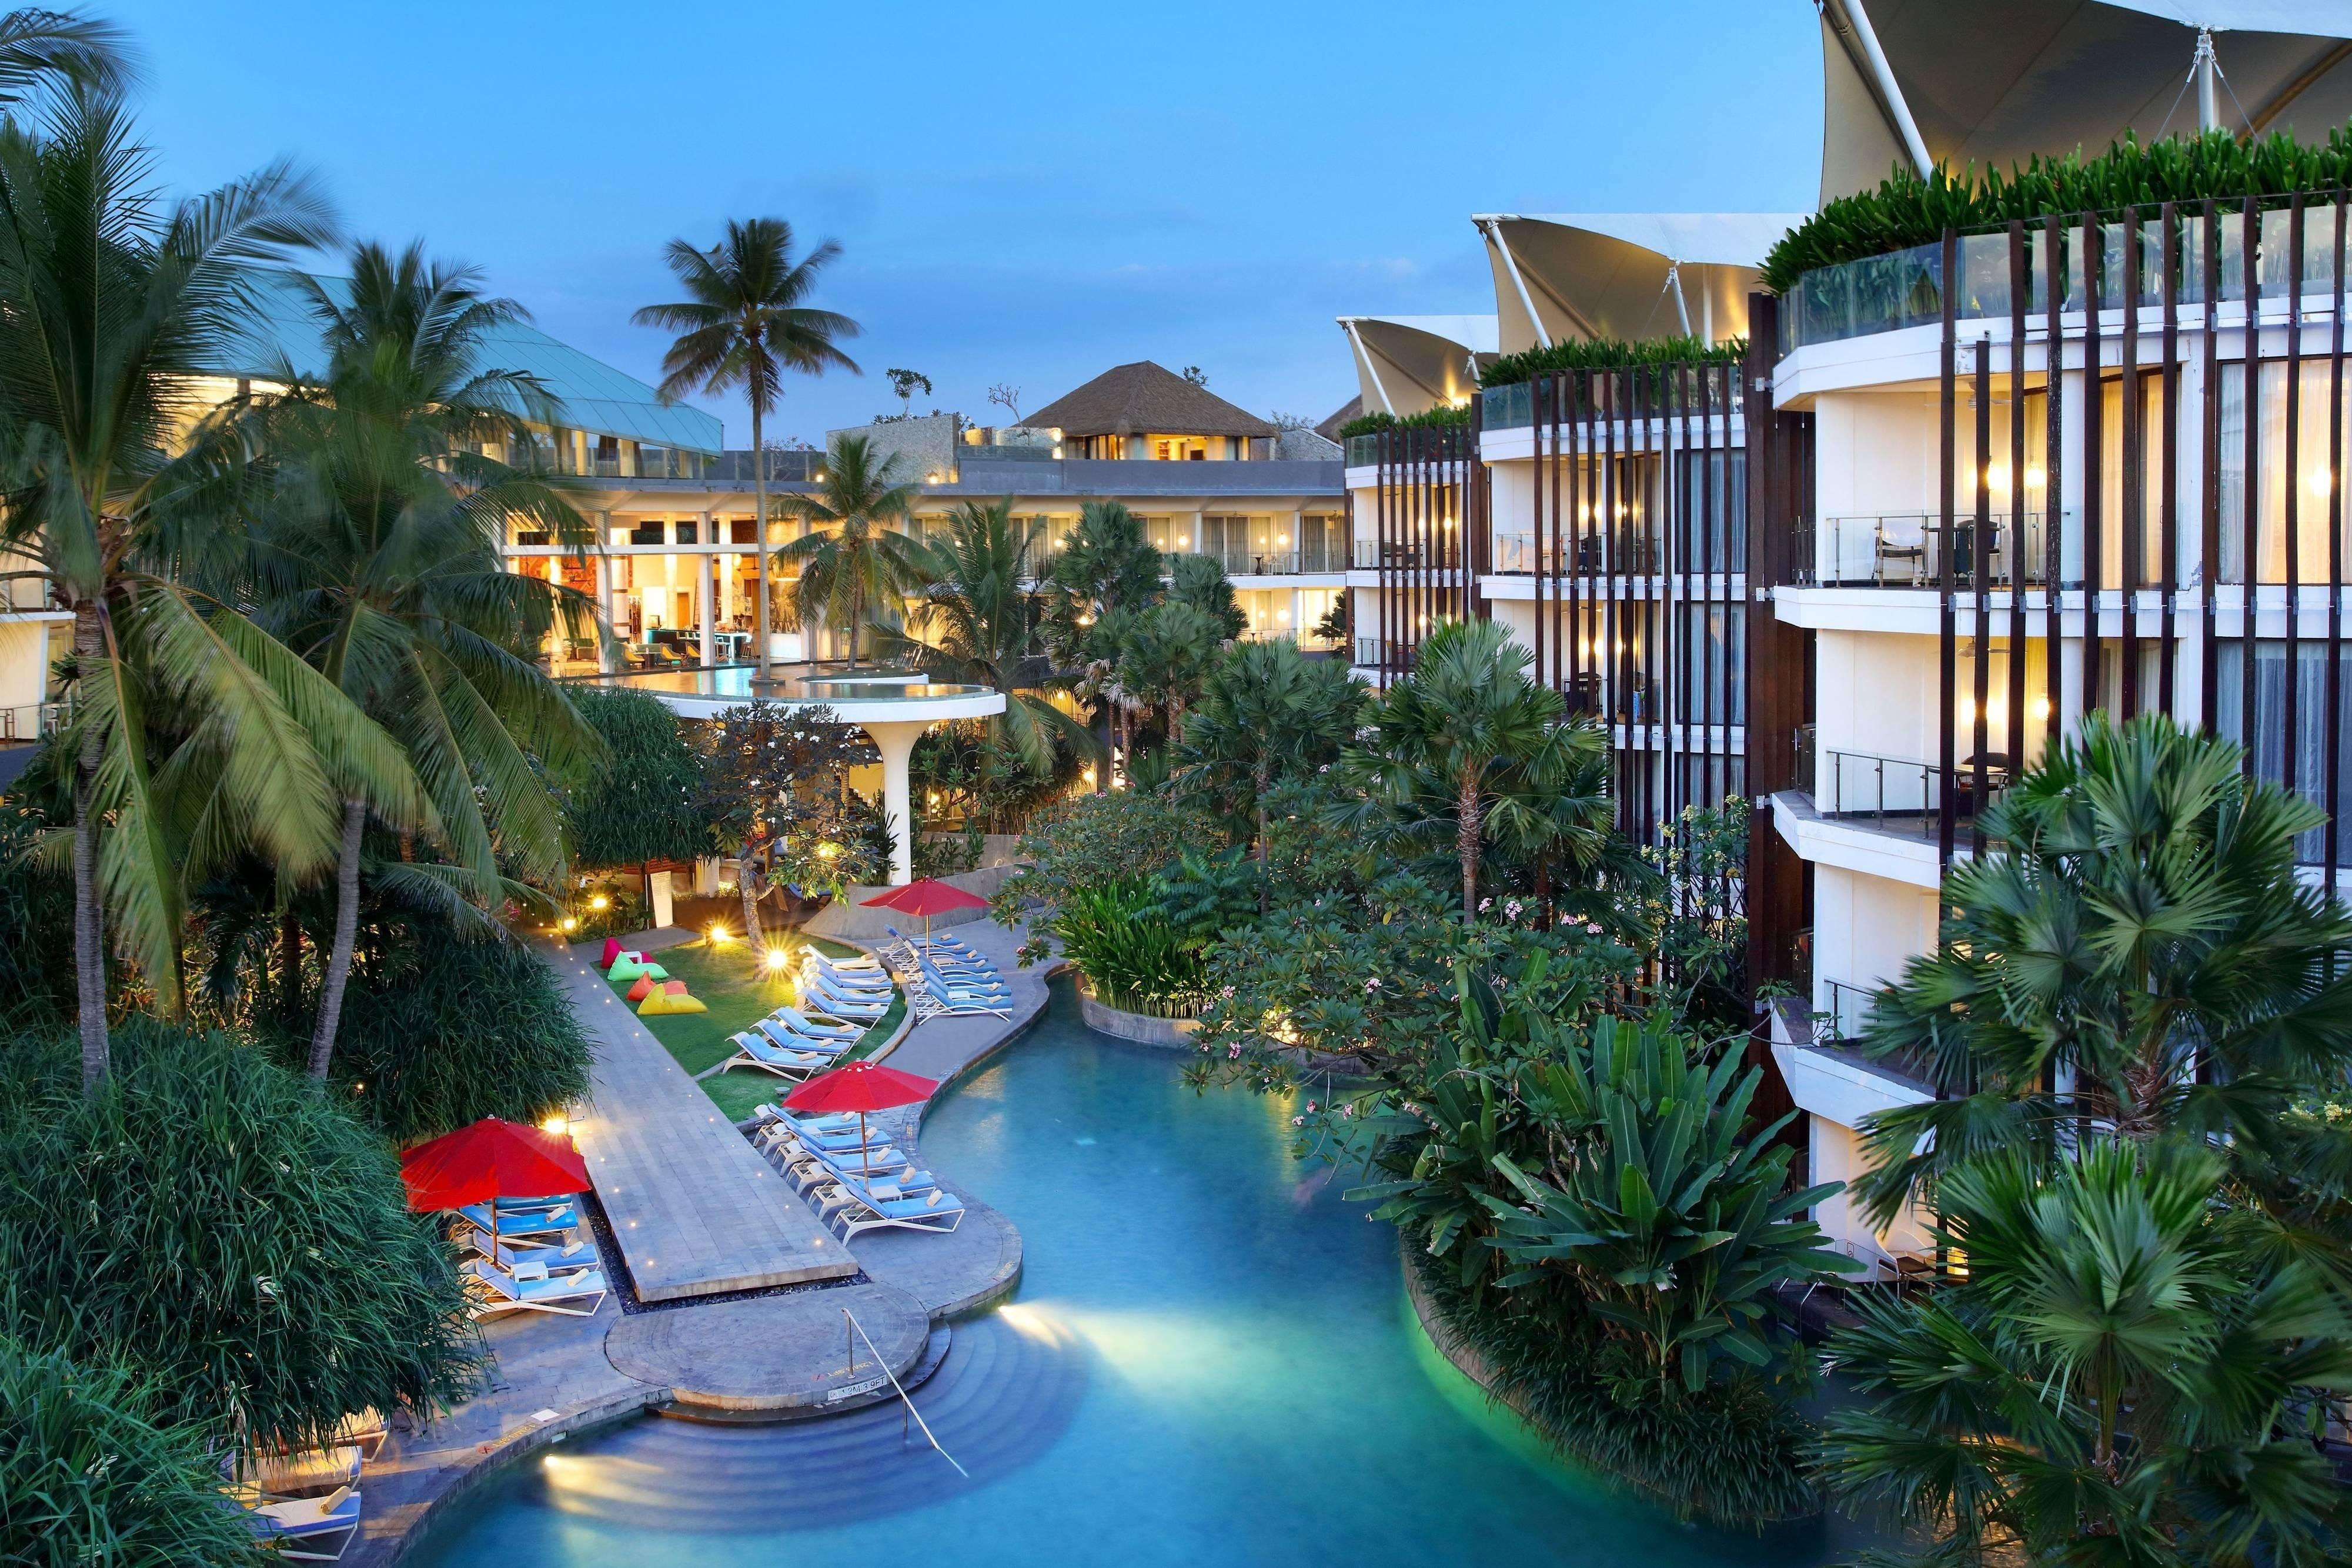 Le Meridien Bali Jimbaran Deluxe Jimbaran Indonesia Hotels Gds Reservation Codes Travel Weekly